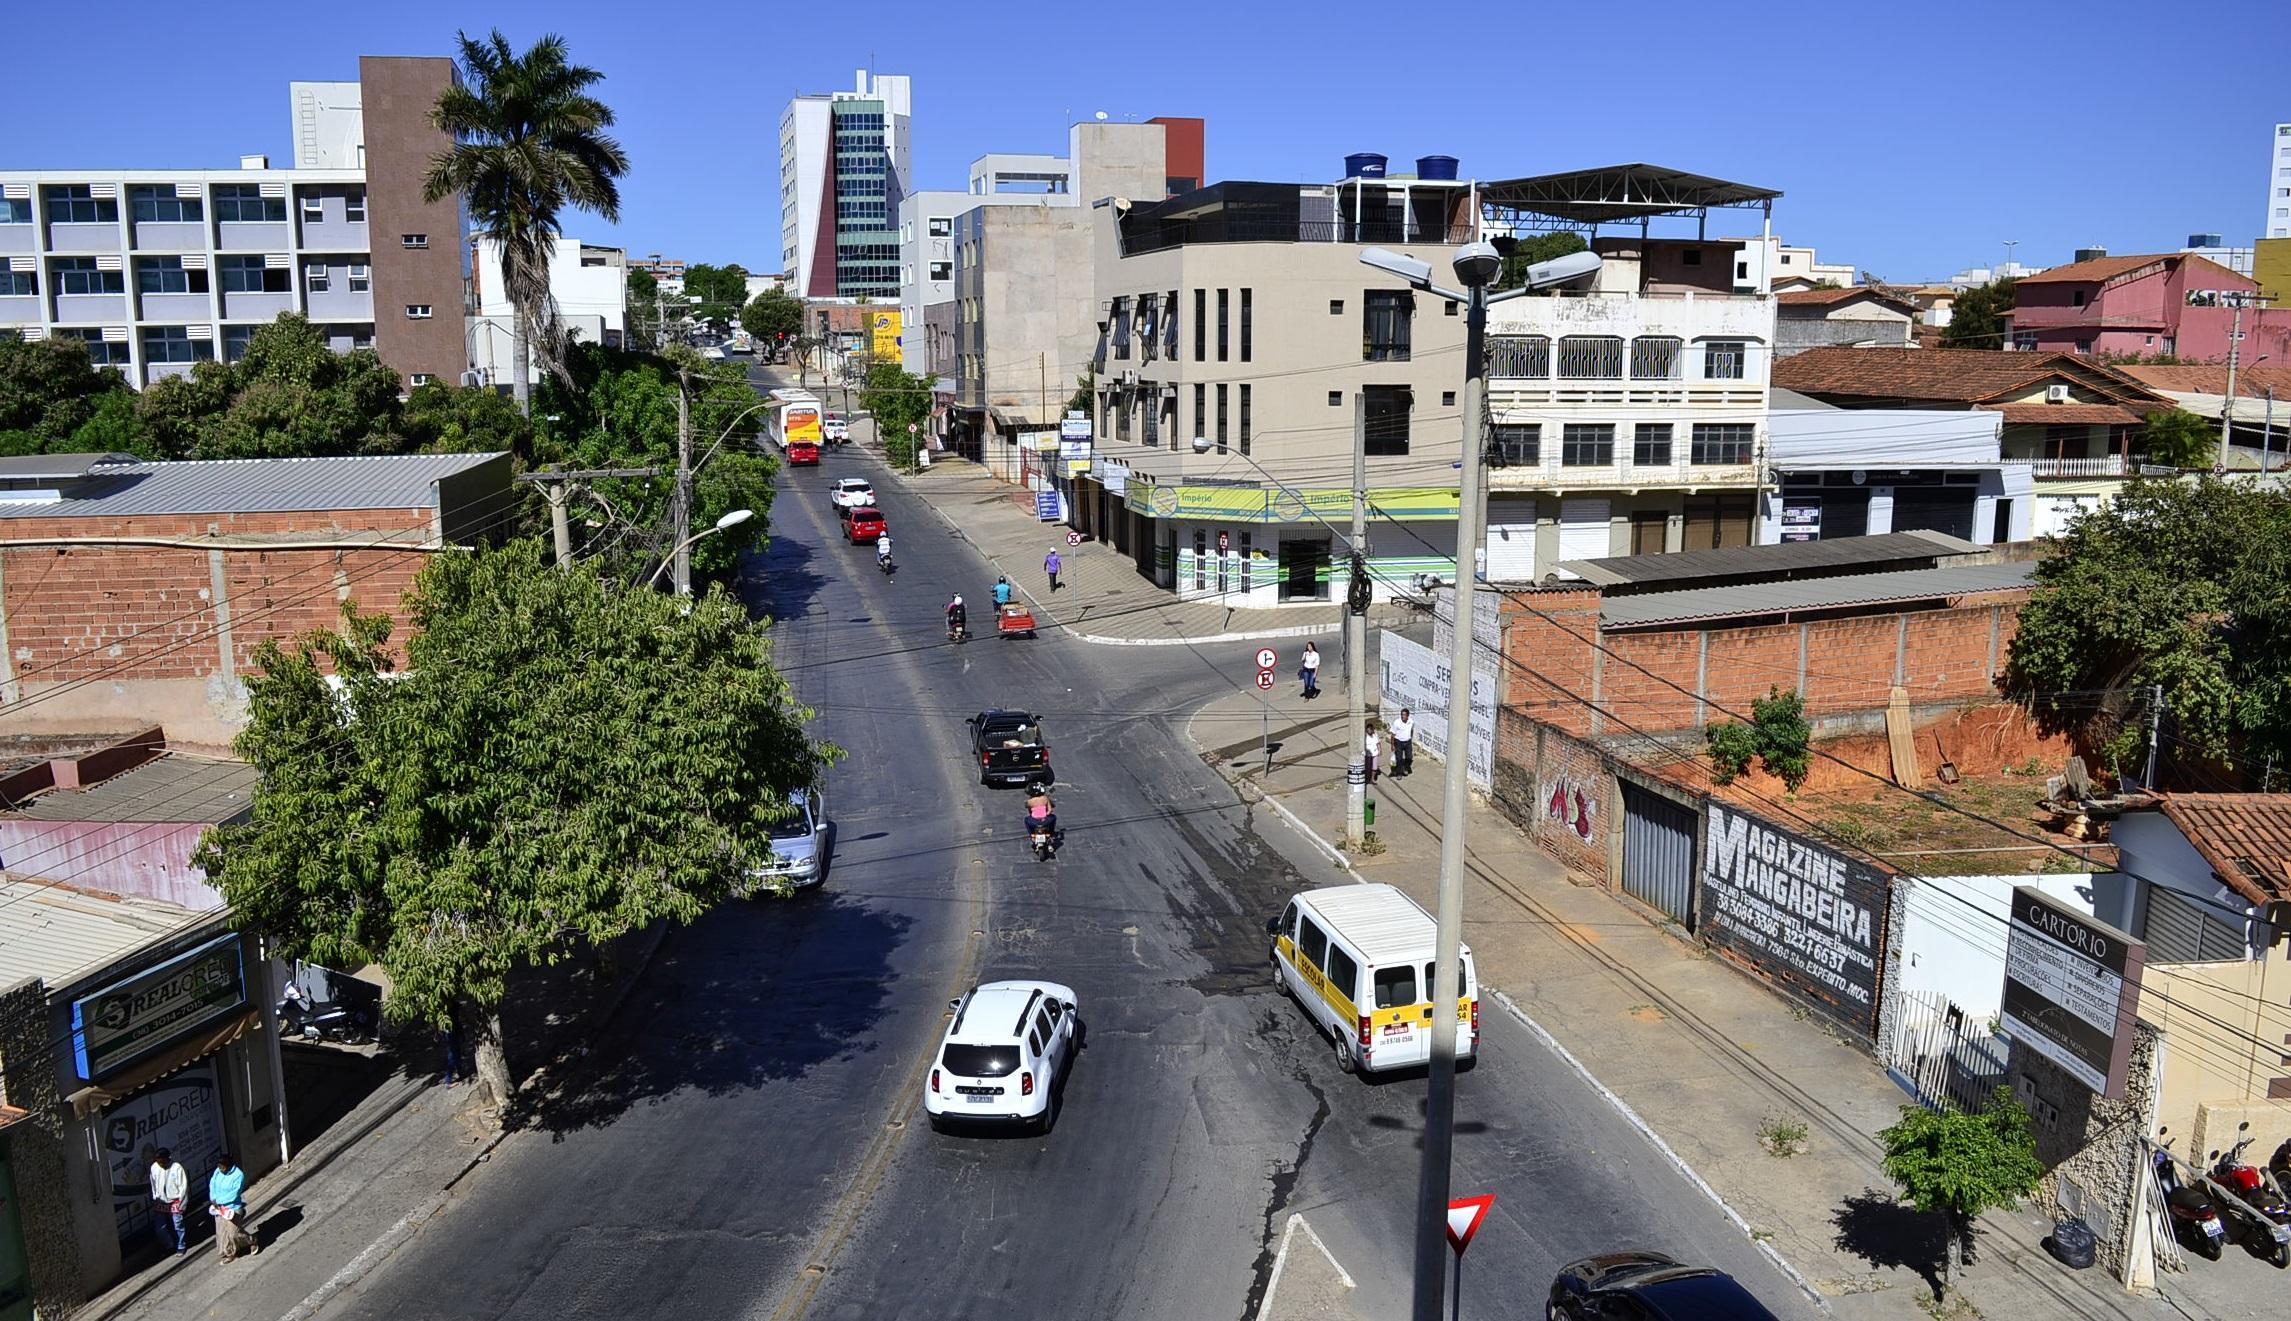 Imagem de destaque Prefeitura vai recuperar as grandes avenidas da cidade